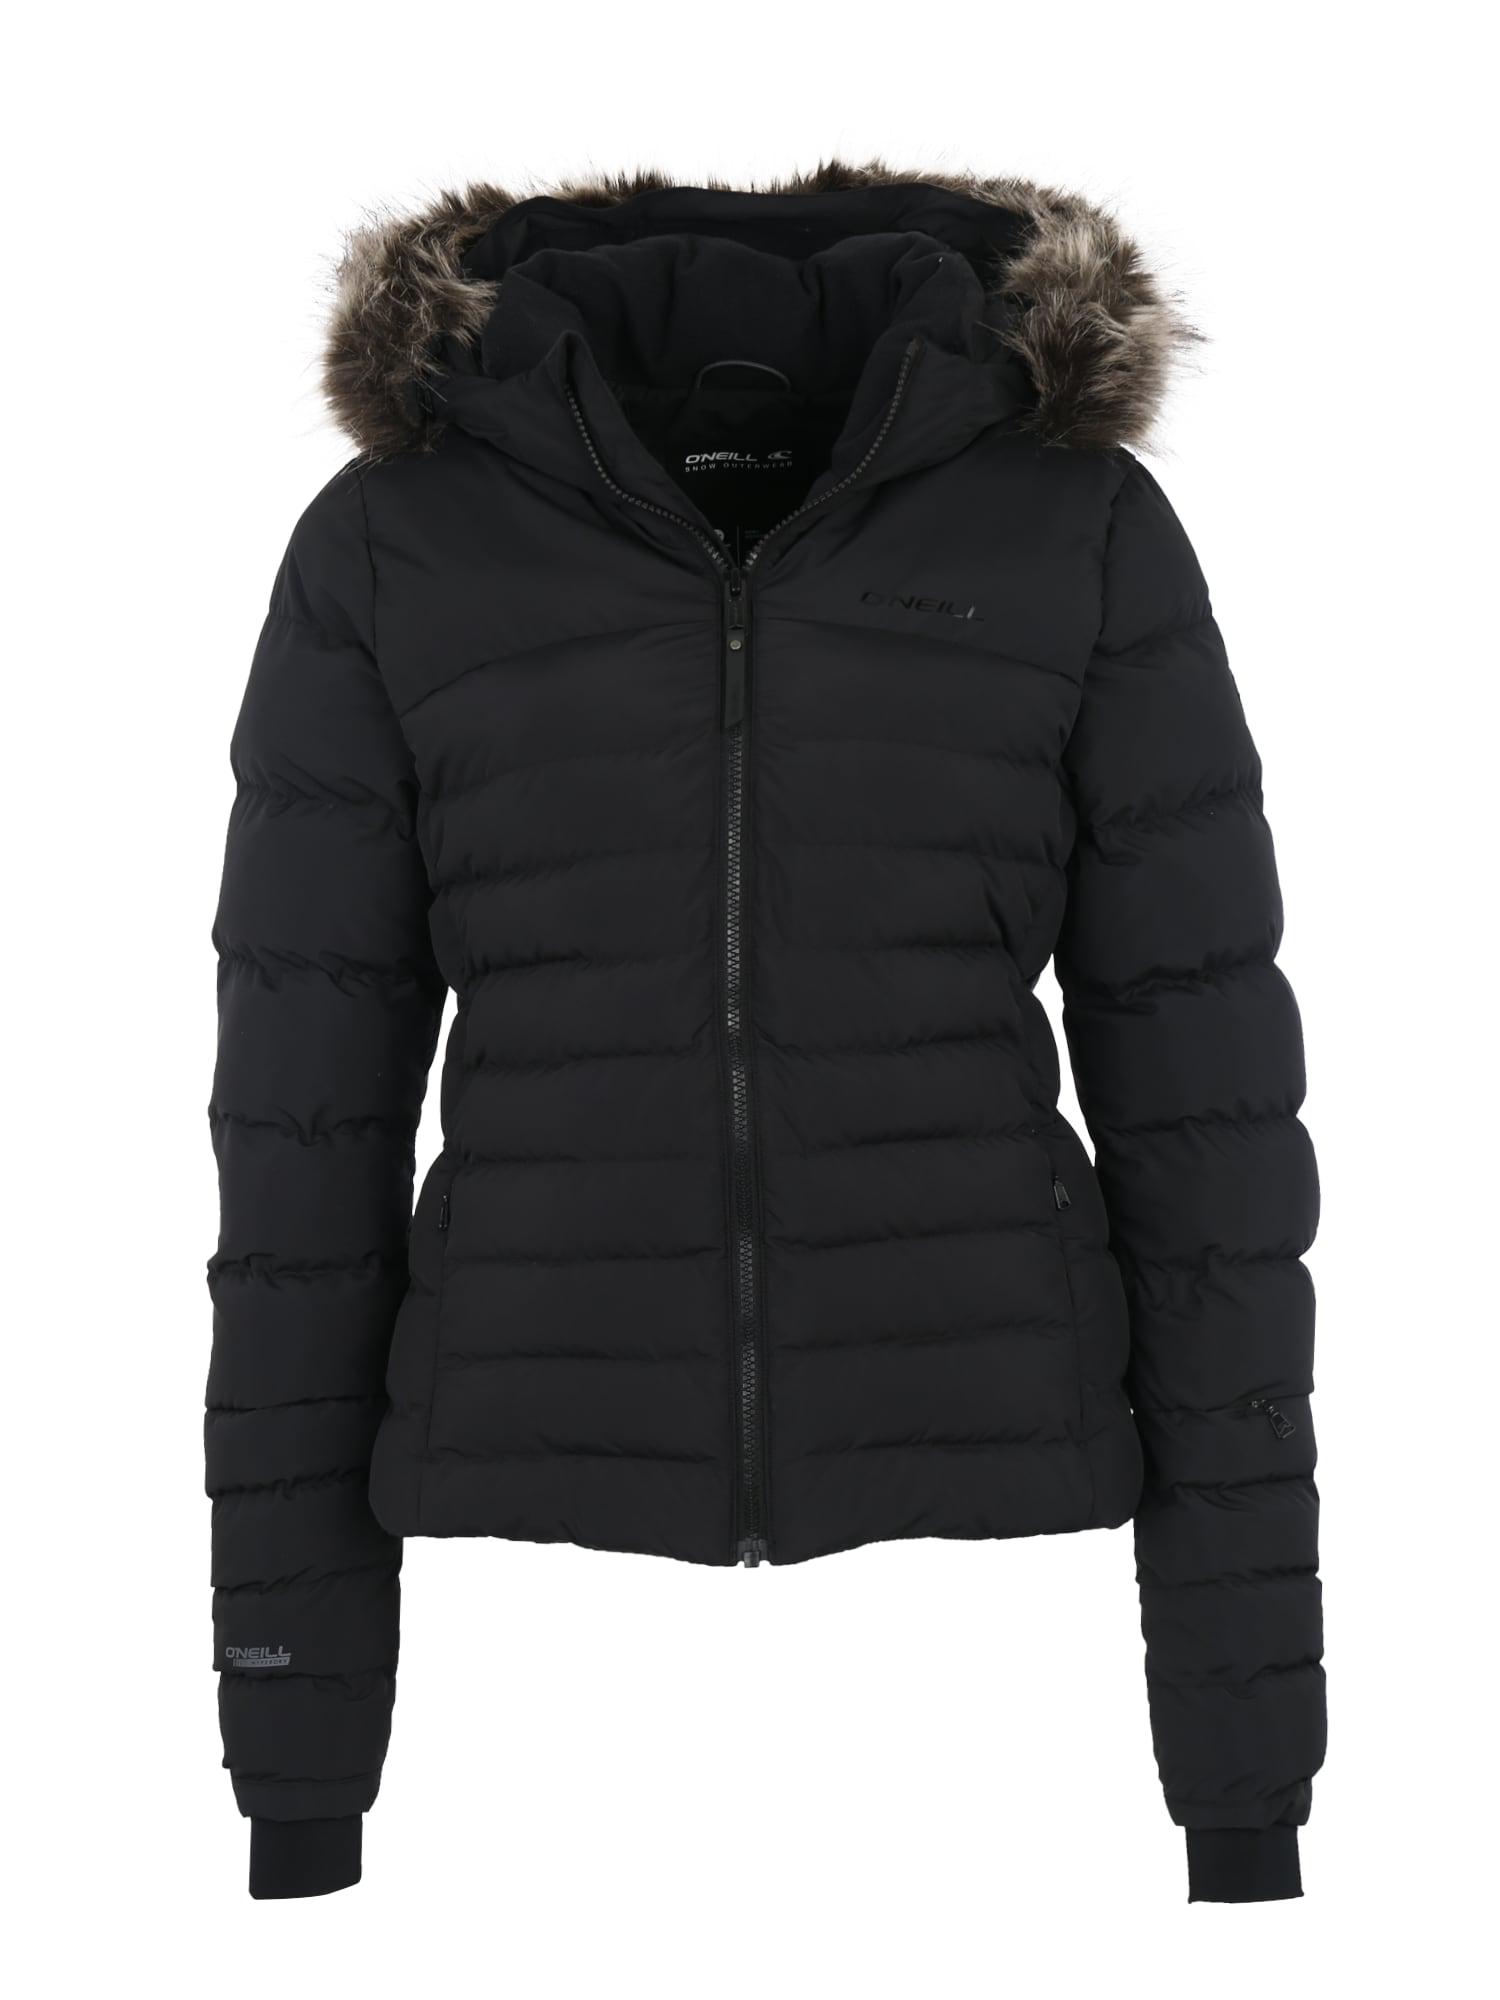 ONEILL Sportovní bunda Phase černá O'NEILL